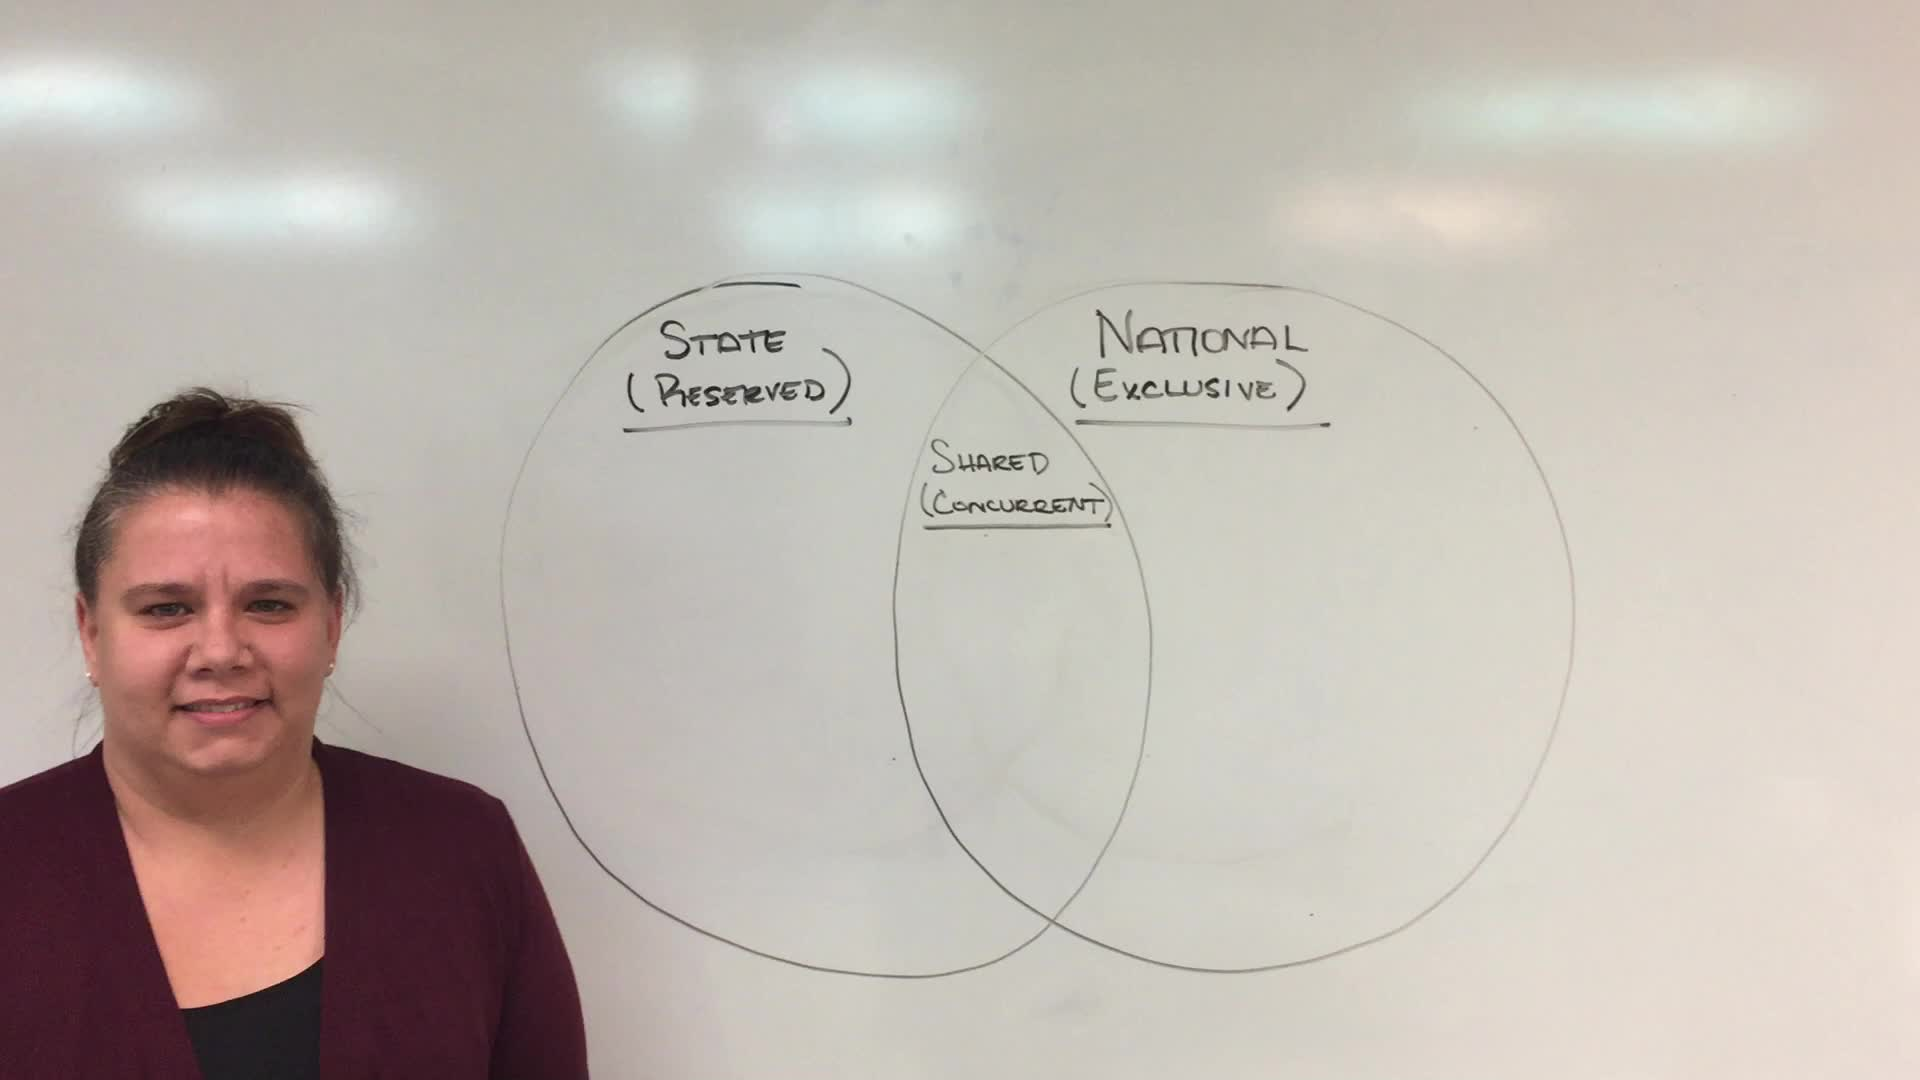 Federalism Venn Diagram